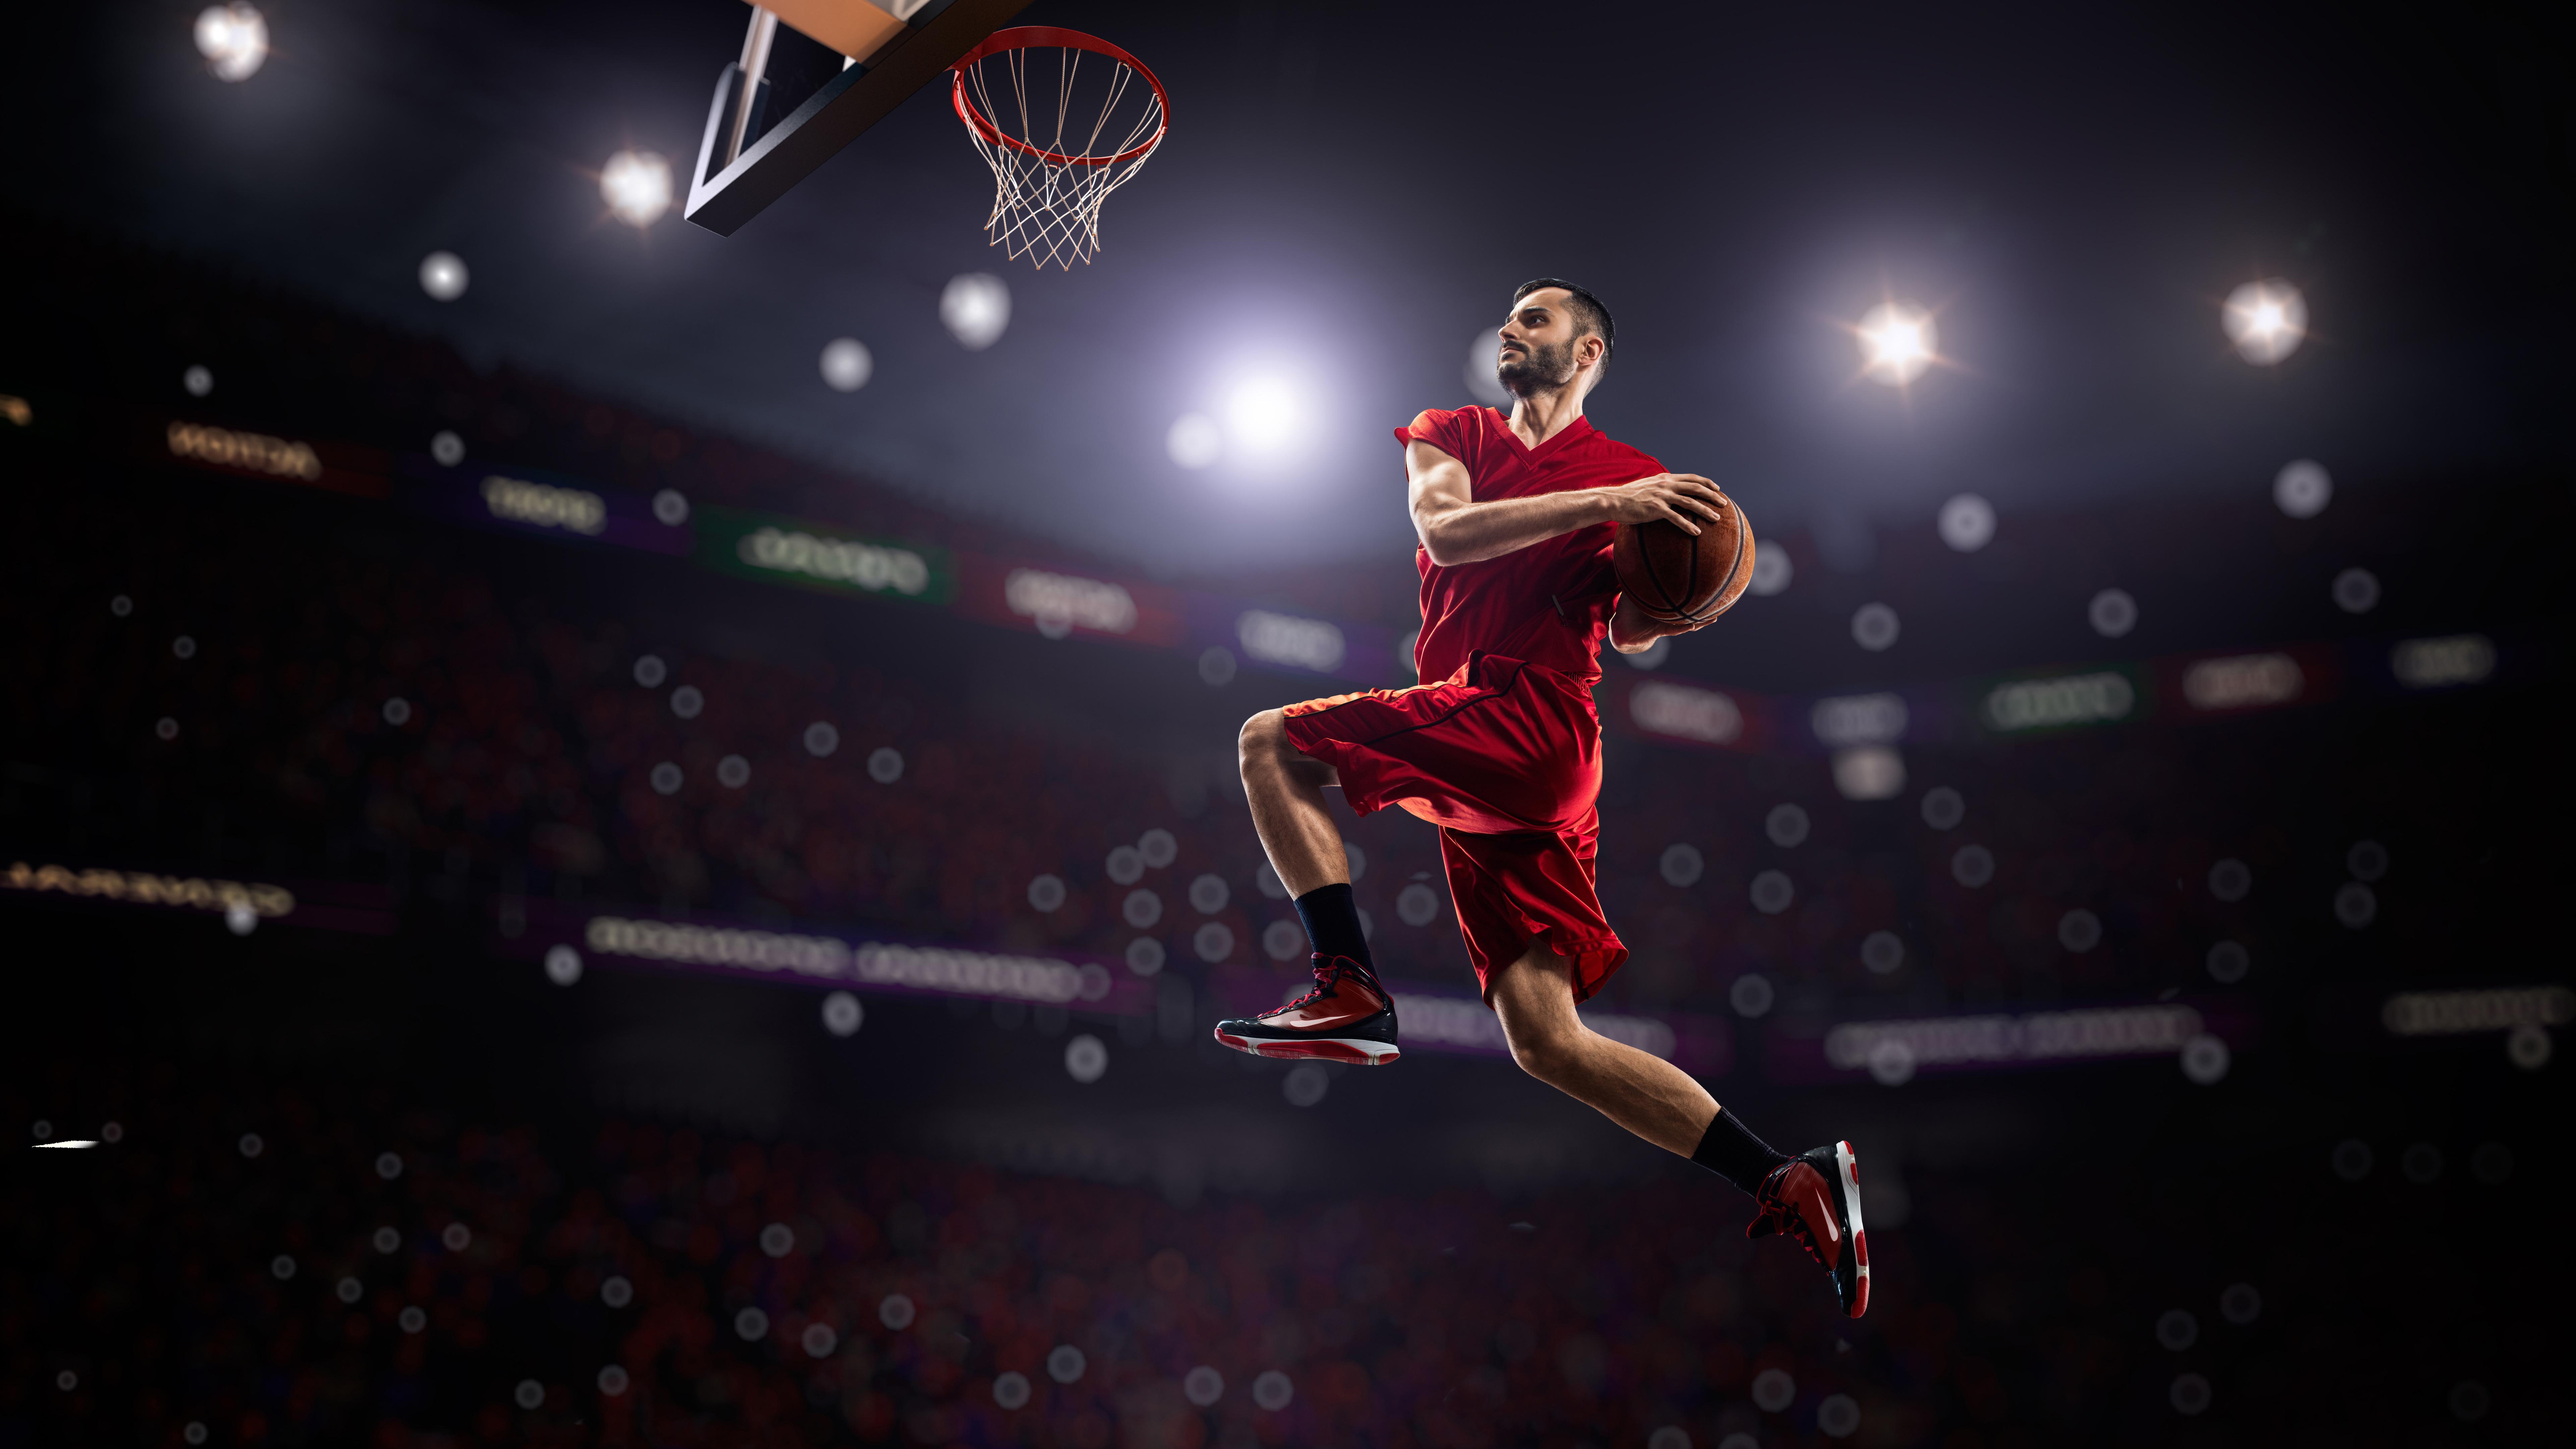 7680x4320 Basketball Man Jumping Playing 8k 8k Hd 4k Wallpapers